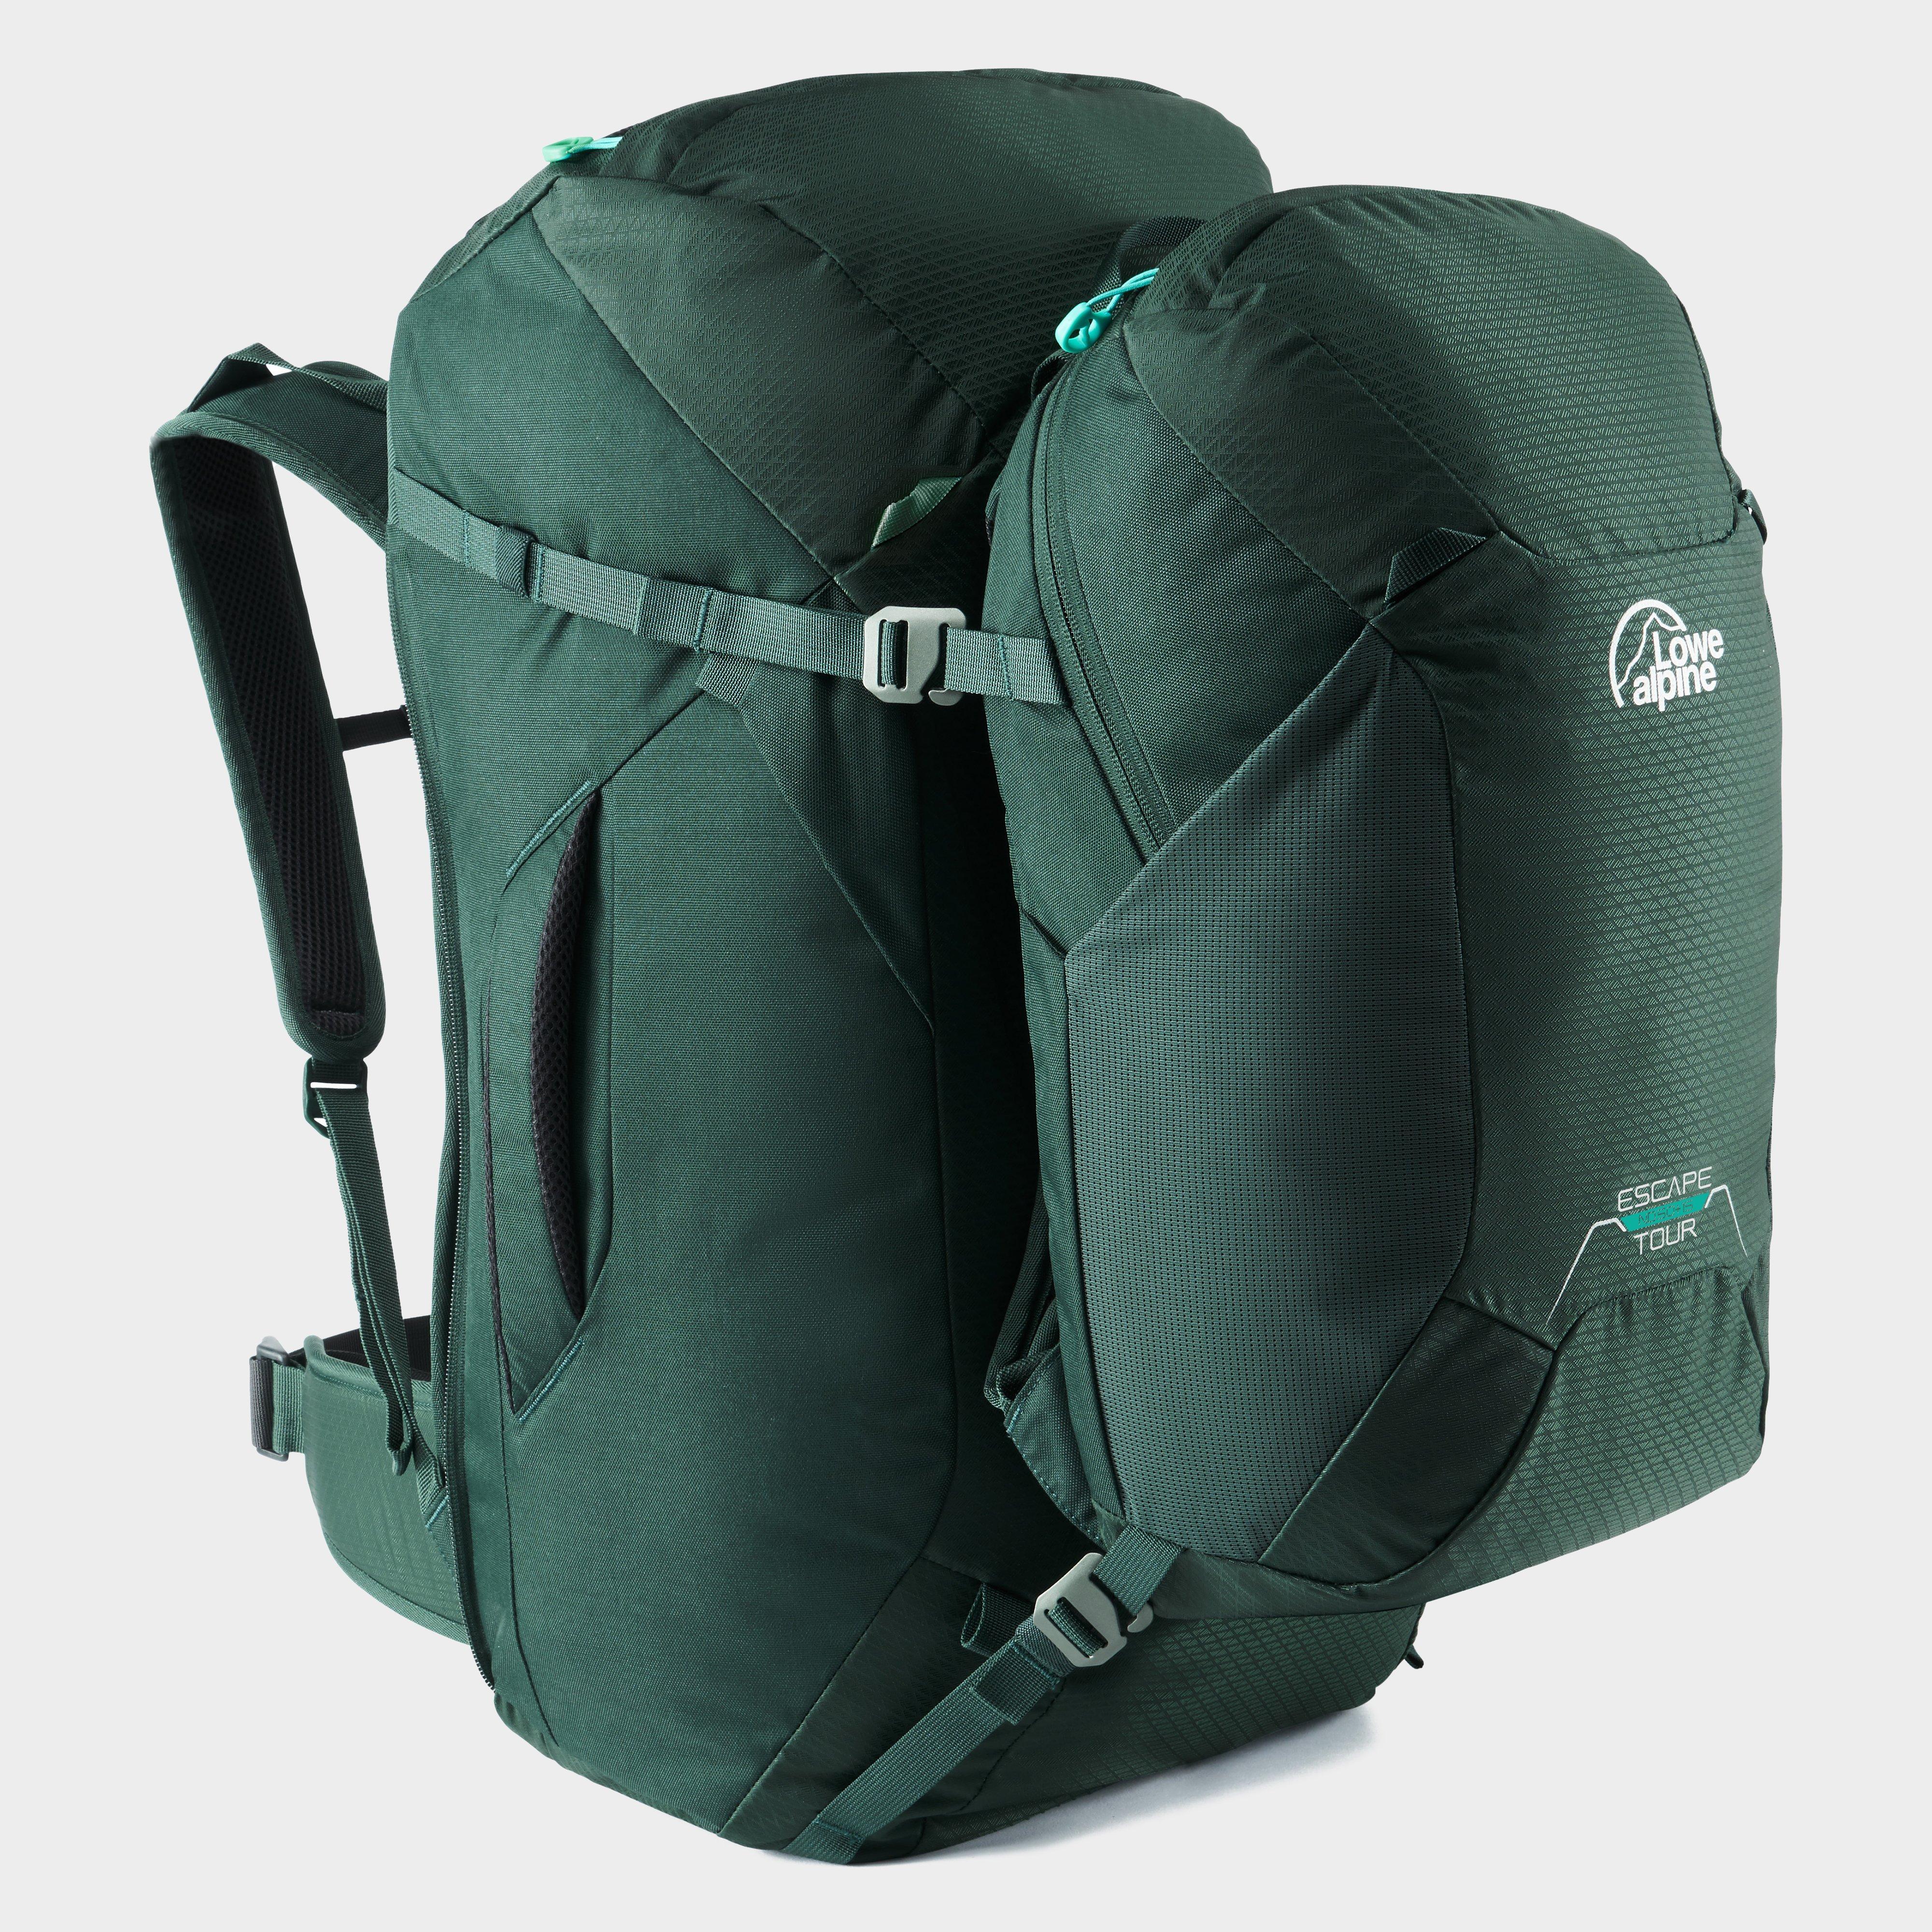 Lowe Alpine Escape Tour Nd50+15L Rucksack - Green/Nd, Green